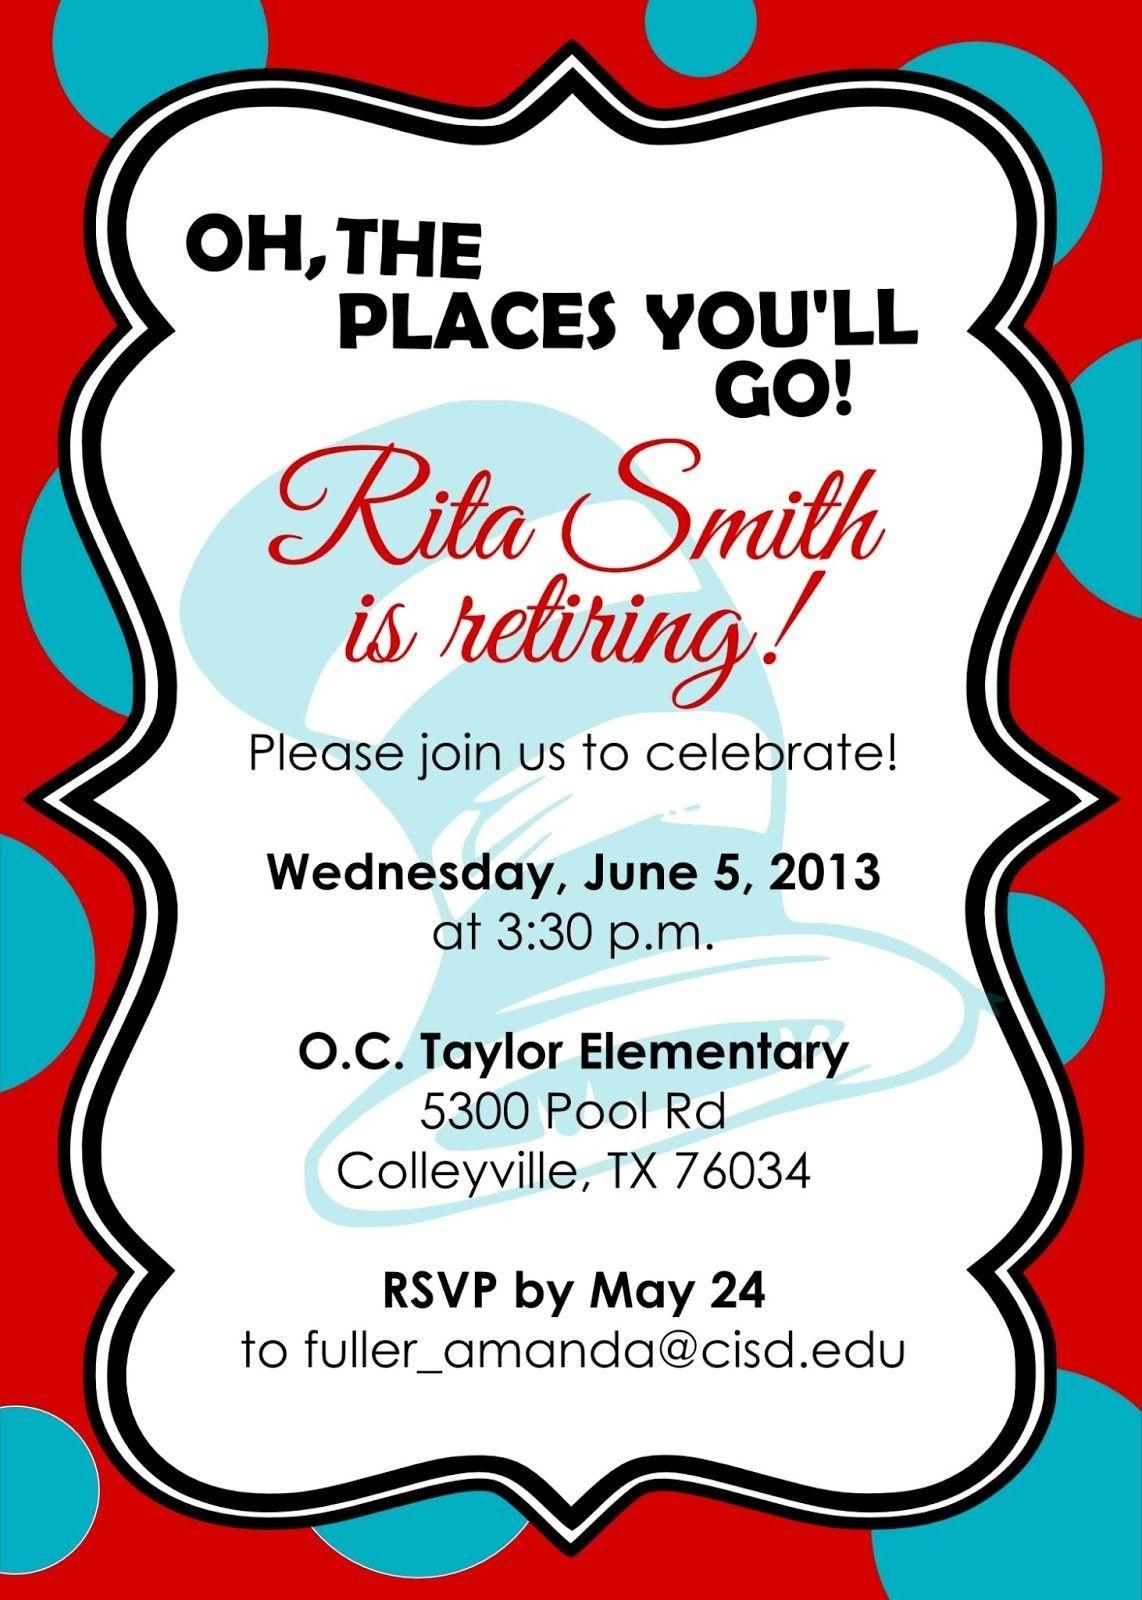 Retirement Party Invitations Free Templates | Fun Stuff | Retirement - Free Printable Retirement Party Invitations